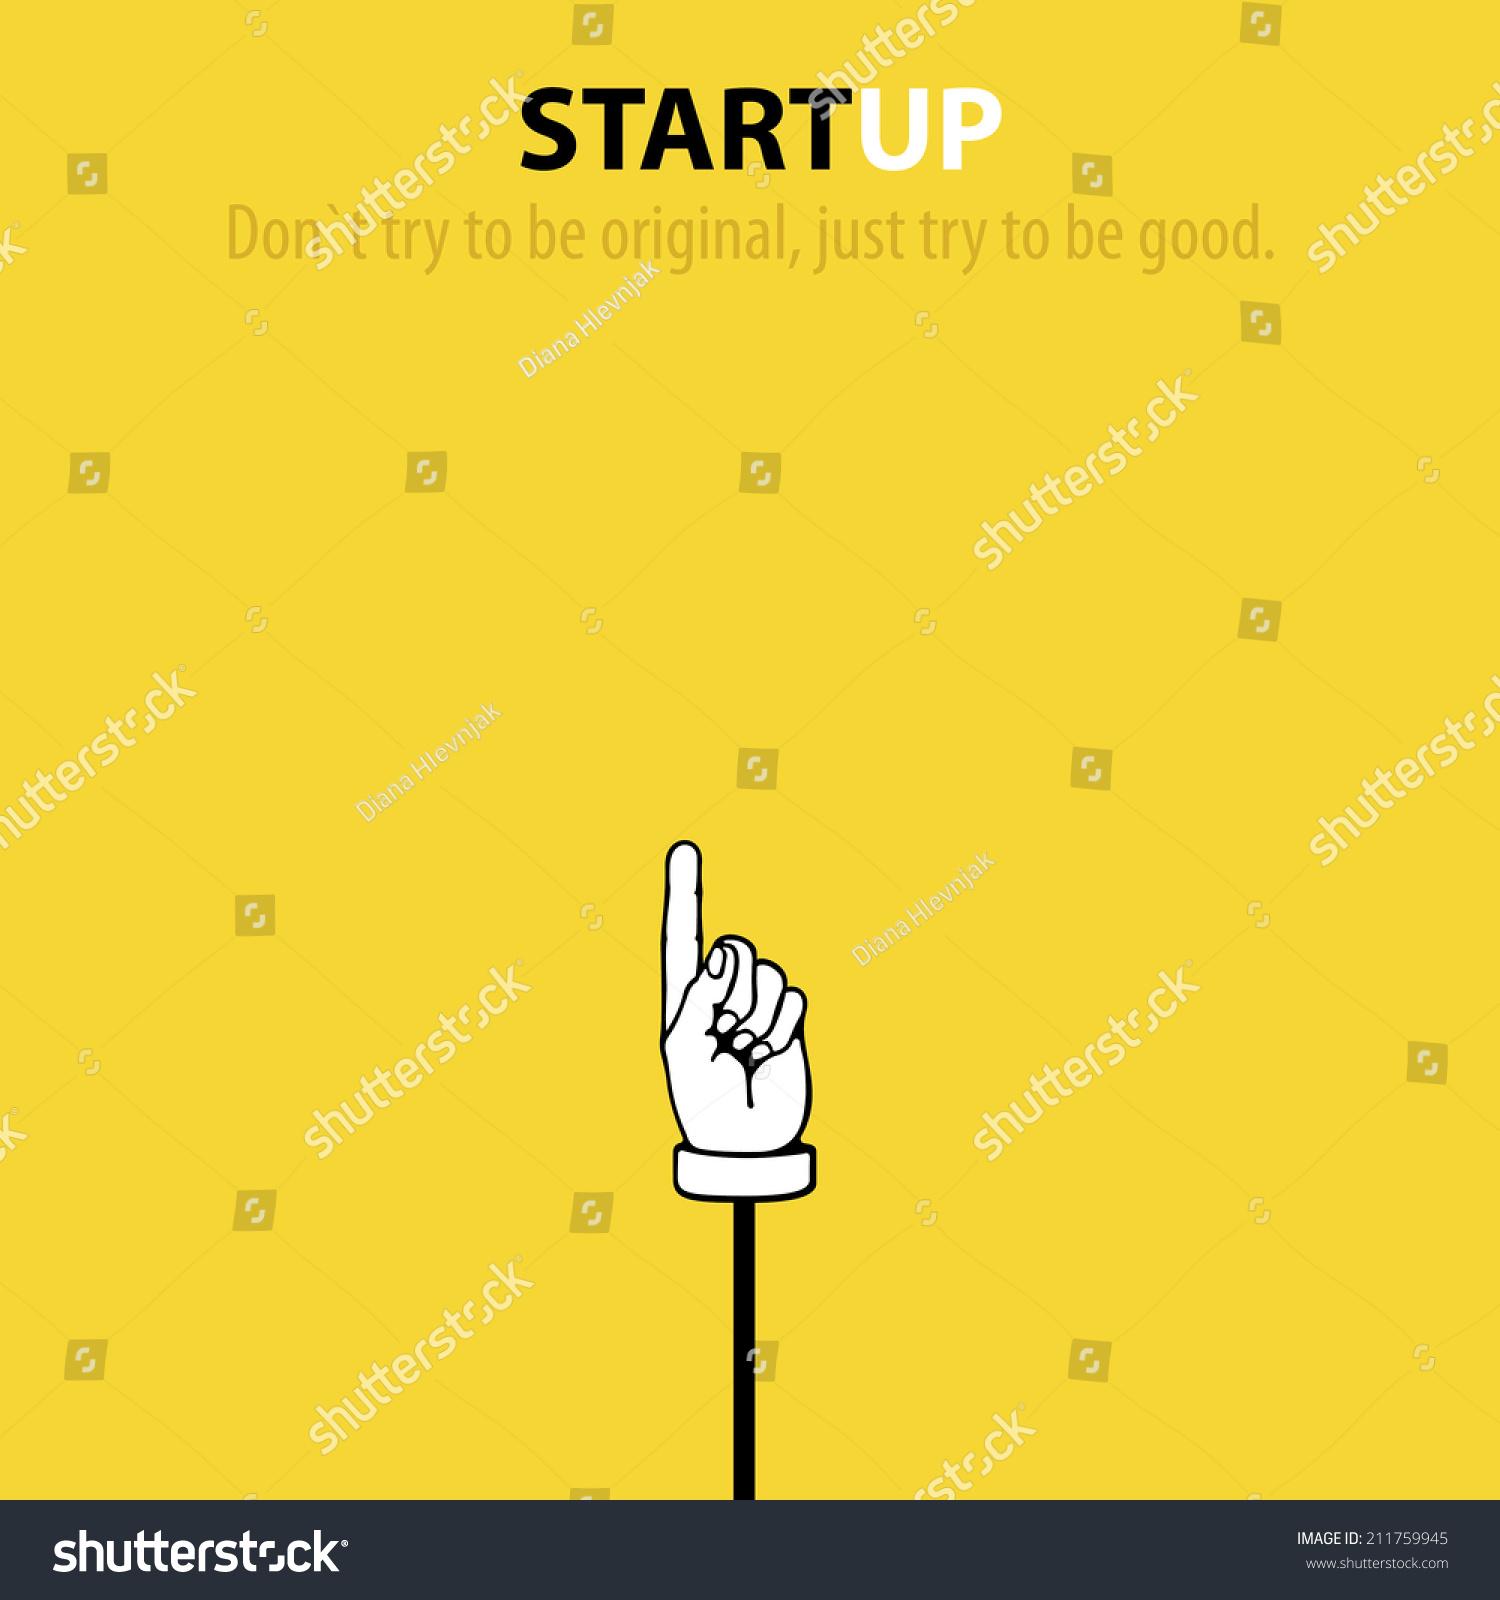 minimalistic startup company wallpaper vector illustration